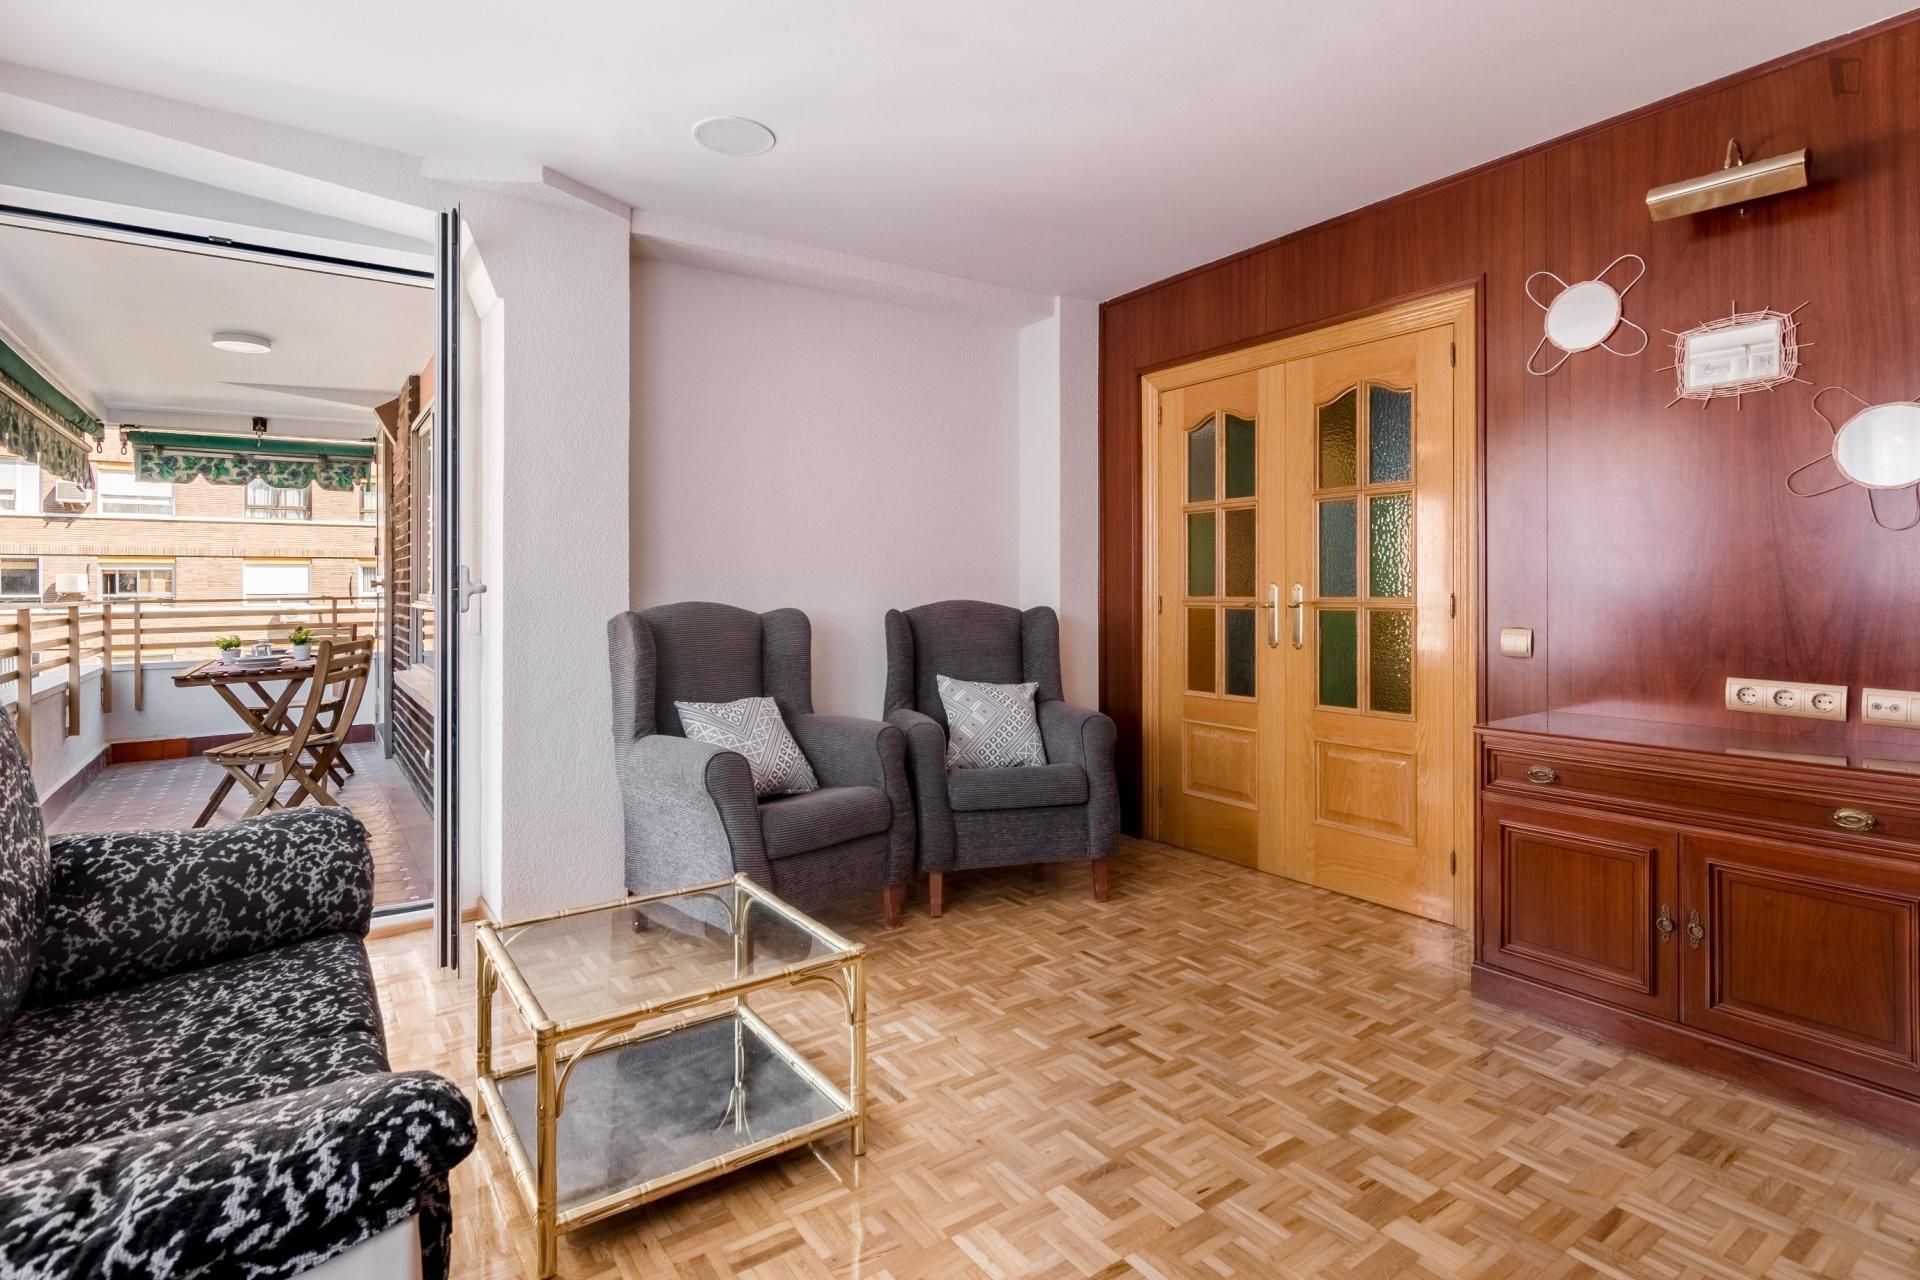 Cobeña - Double bedroom in shared flat in Madrid